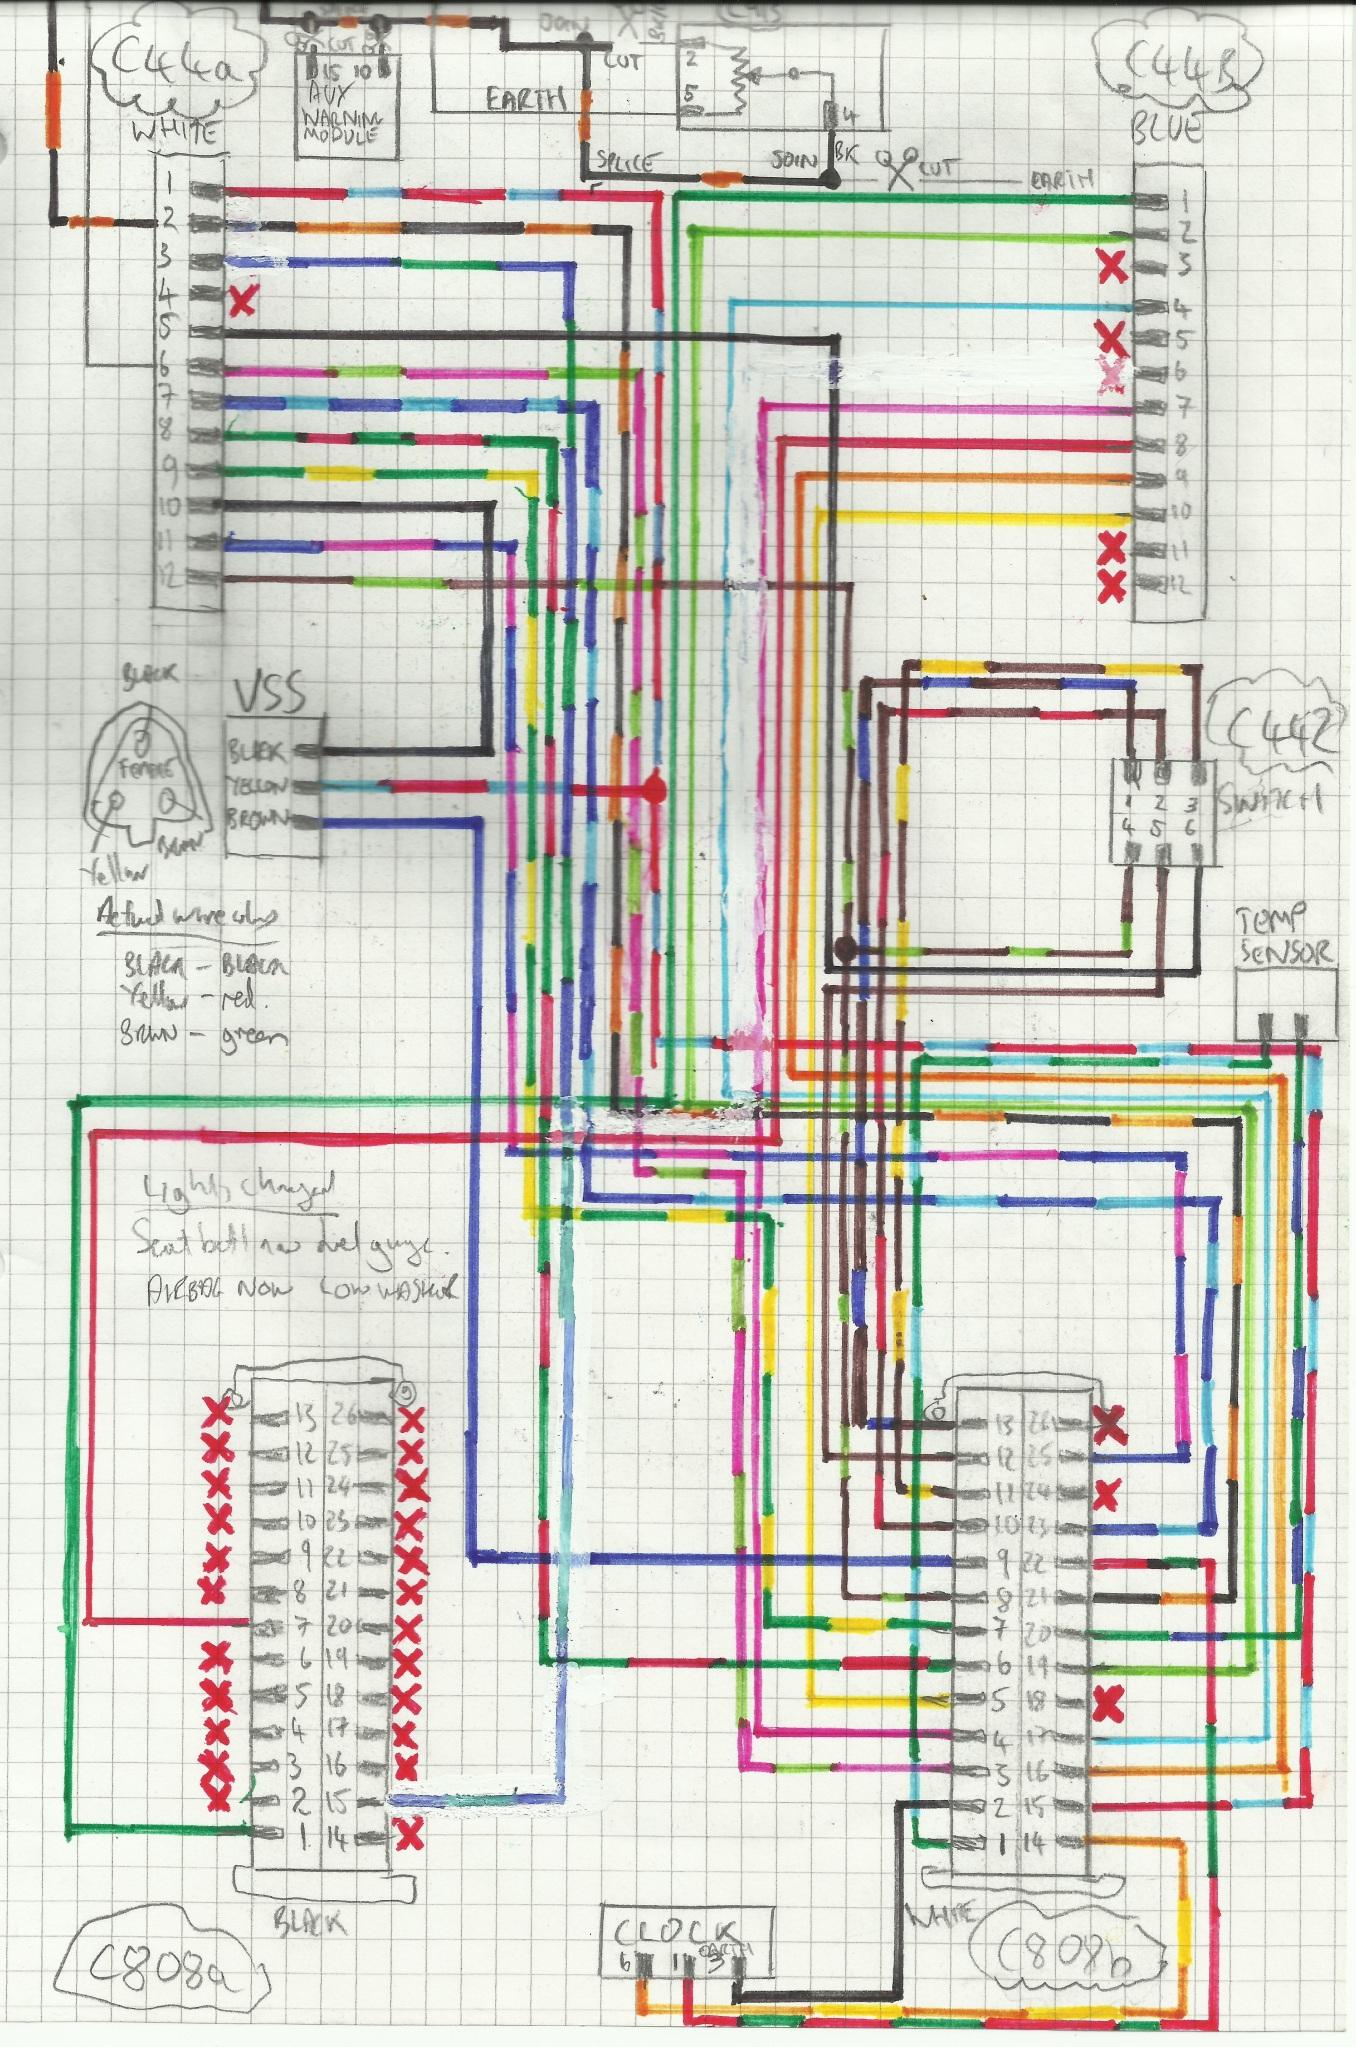 ford puma ecu wiring diagram chinese mini chopper focus st170 clocks and speedo passionford